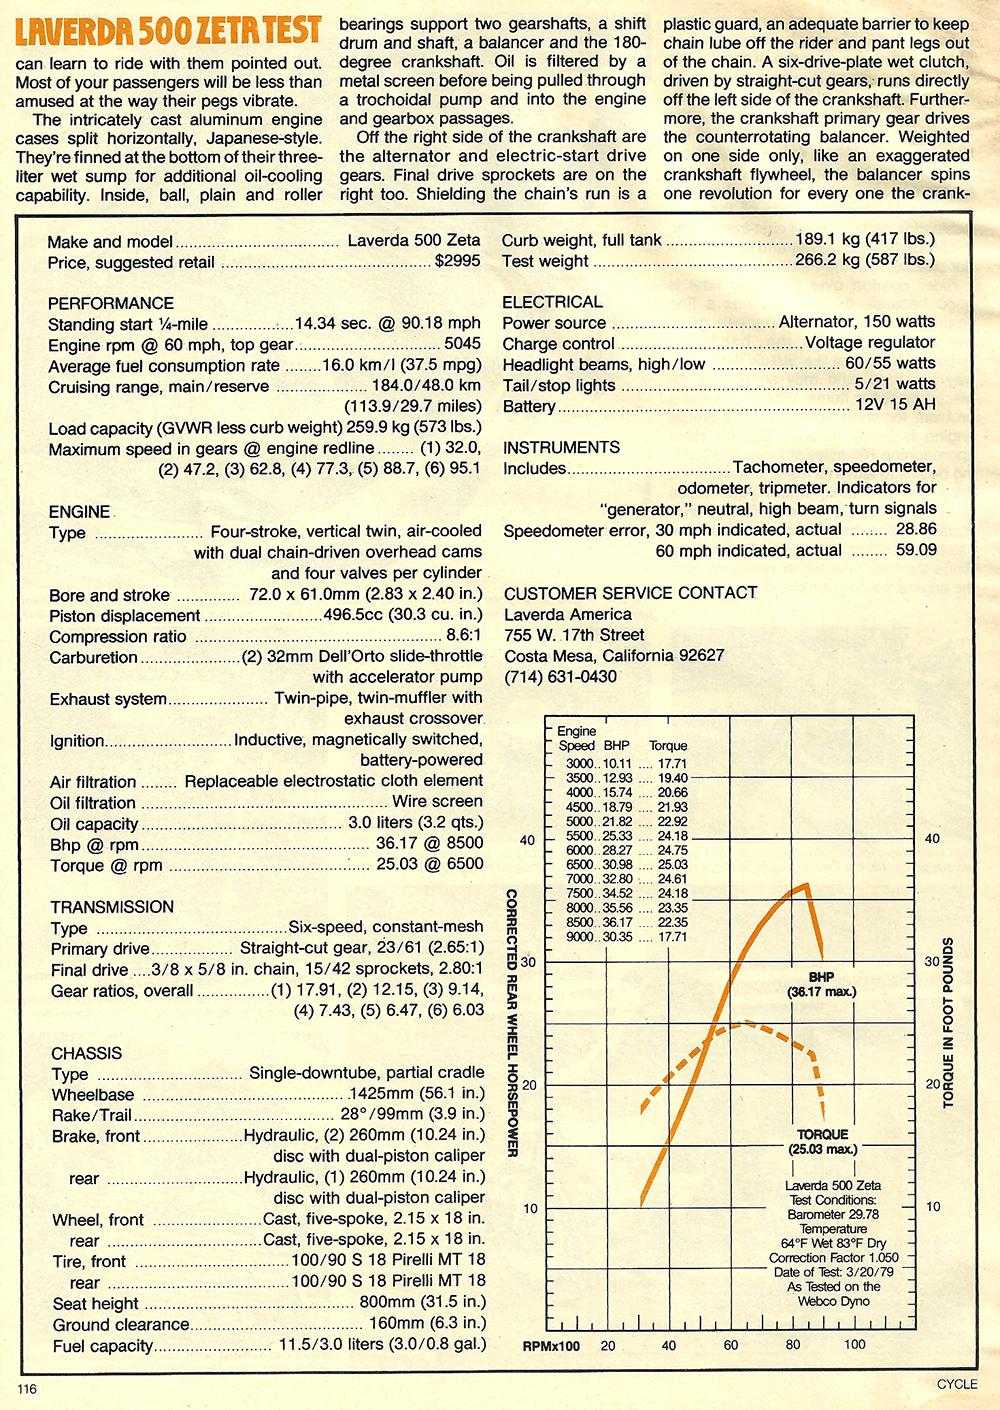 1979 Laverda 500 Zeta road test 7.jpg